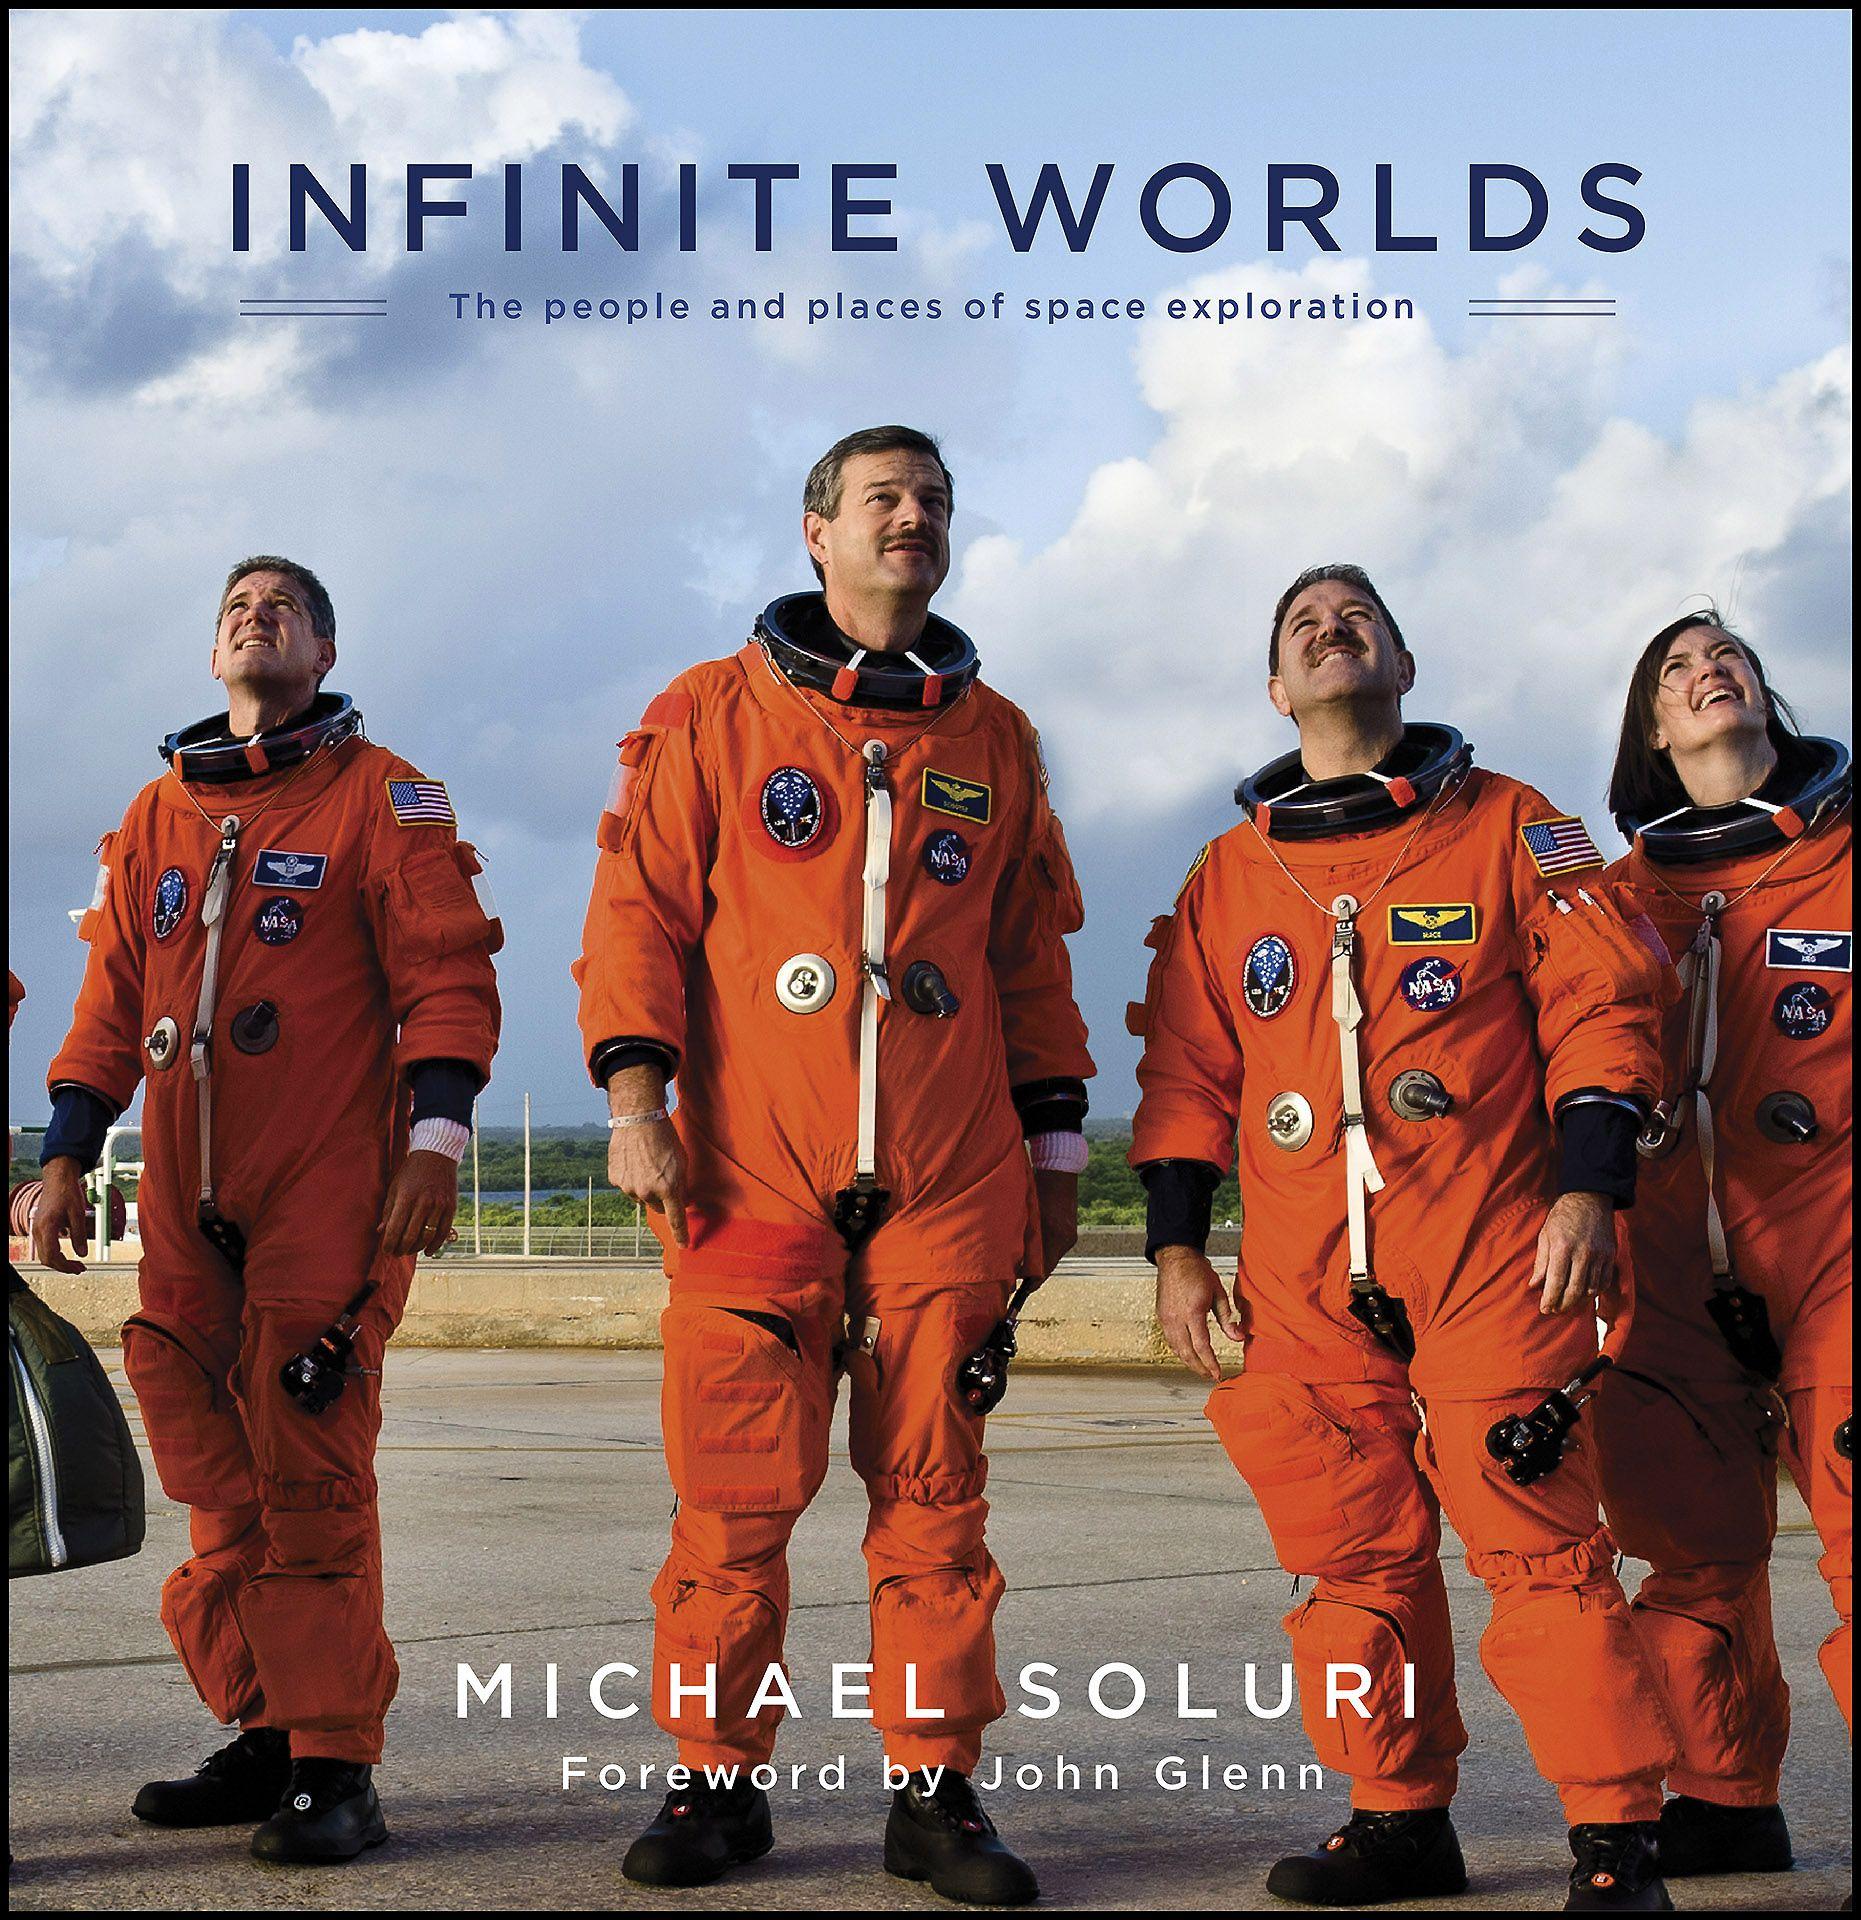 Infinite Worlds Cover_BookLink5.31.jpg